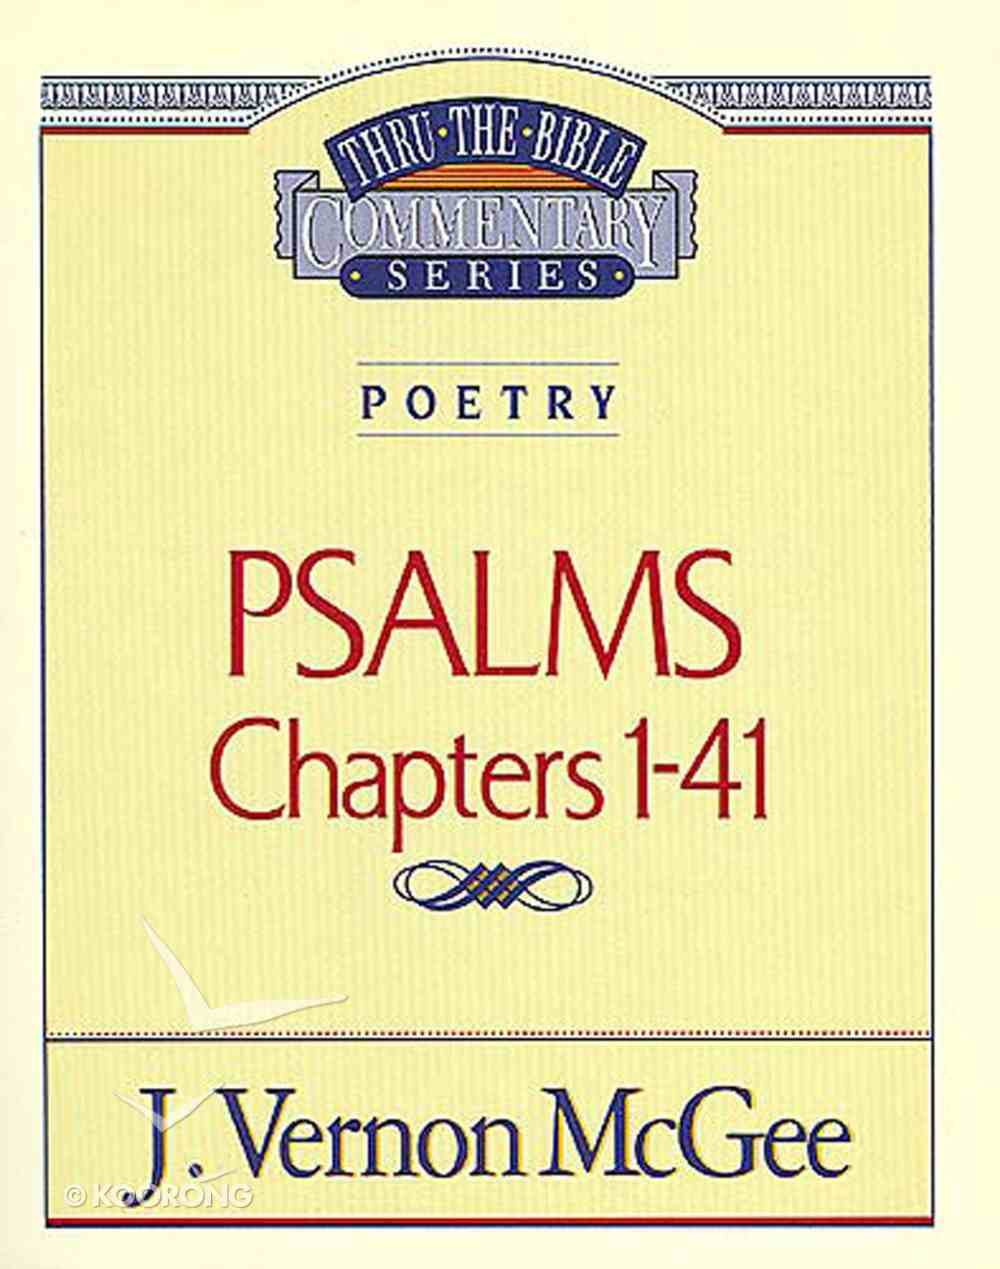 Thru the Bible OT #17: Psalms (Volume 1) (#17 in Thru The Bible Old Testament Series) eBook